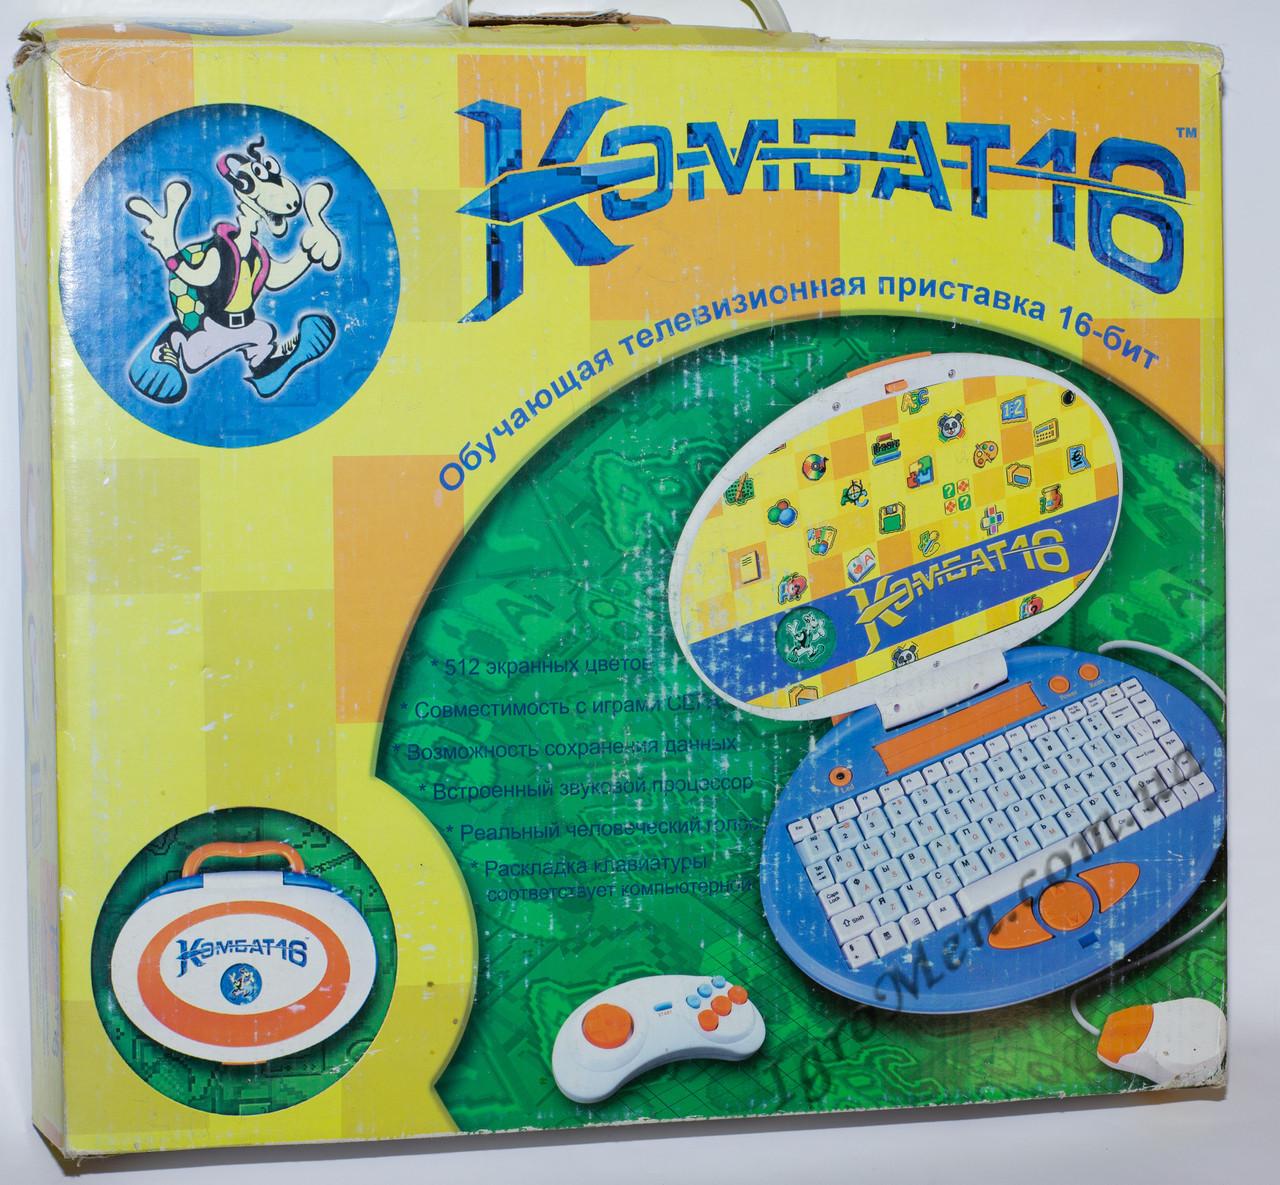 Sega Mega Drive (Комбат 16, обучающая, 2000-х)